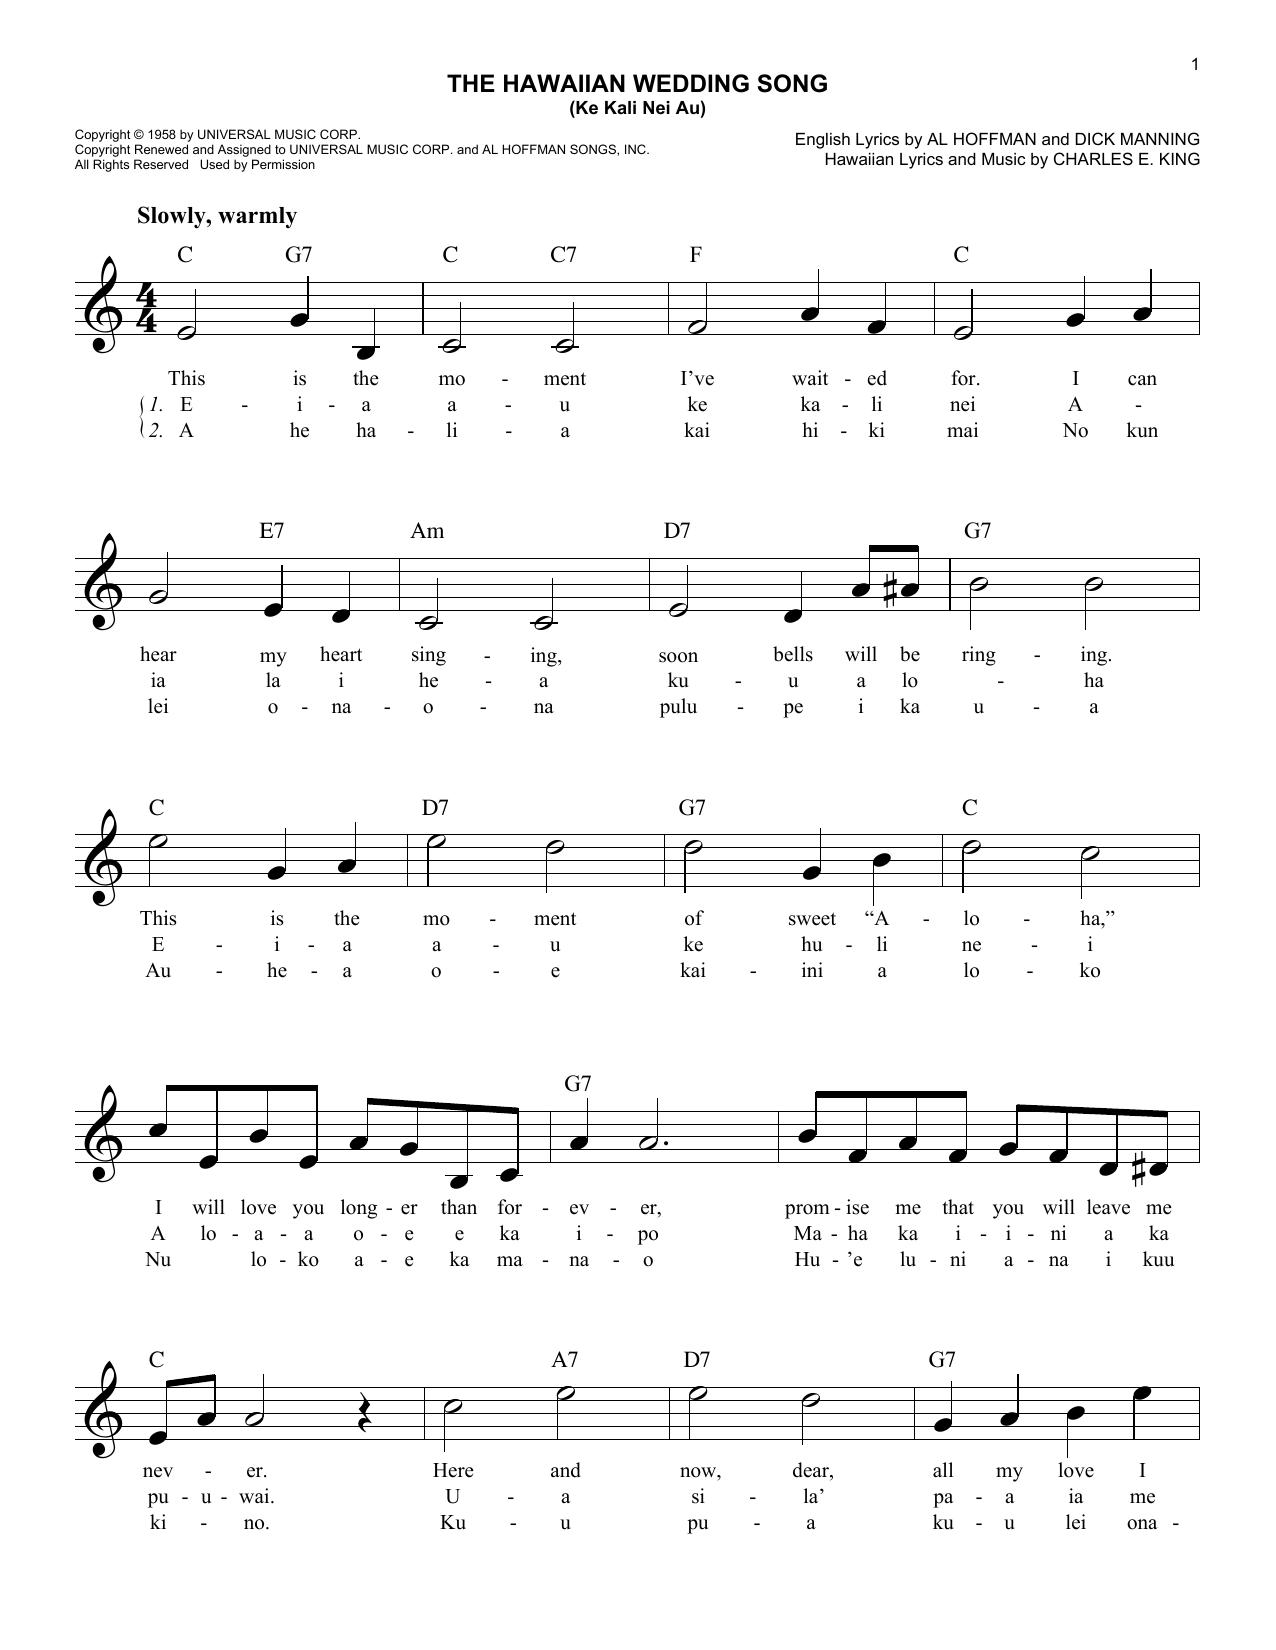 Charles E. King The Hawaiian Wedding Song (Ke Kali Nei Au) sheet music notes and chords. Download Printable PDF.